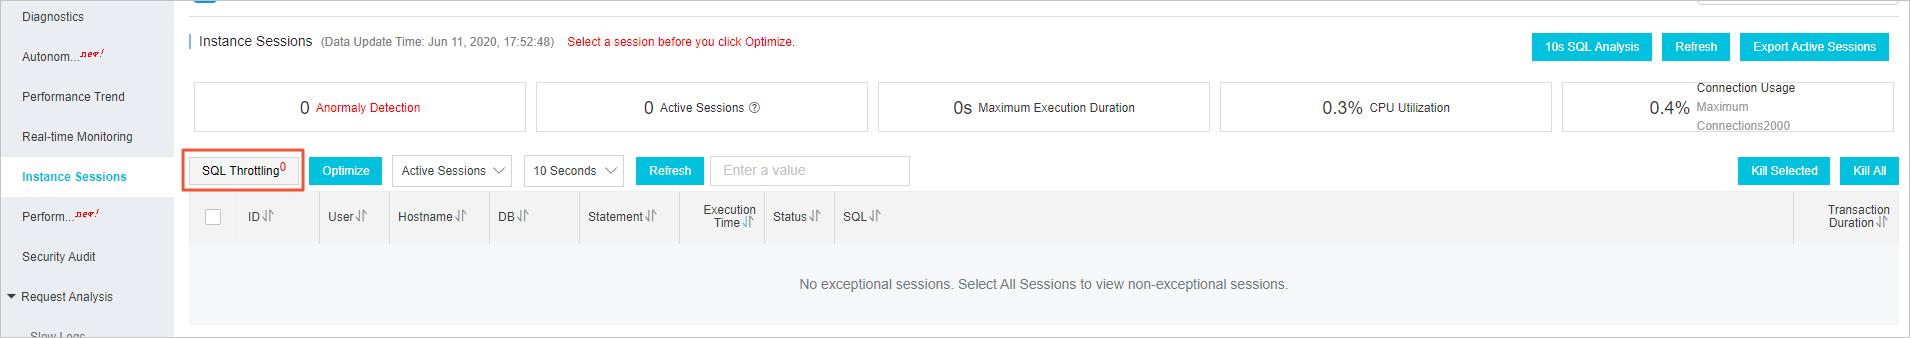 SQL Throttling1